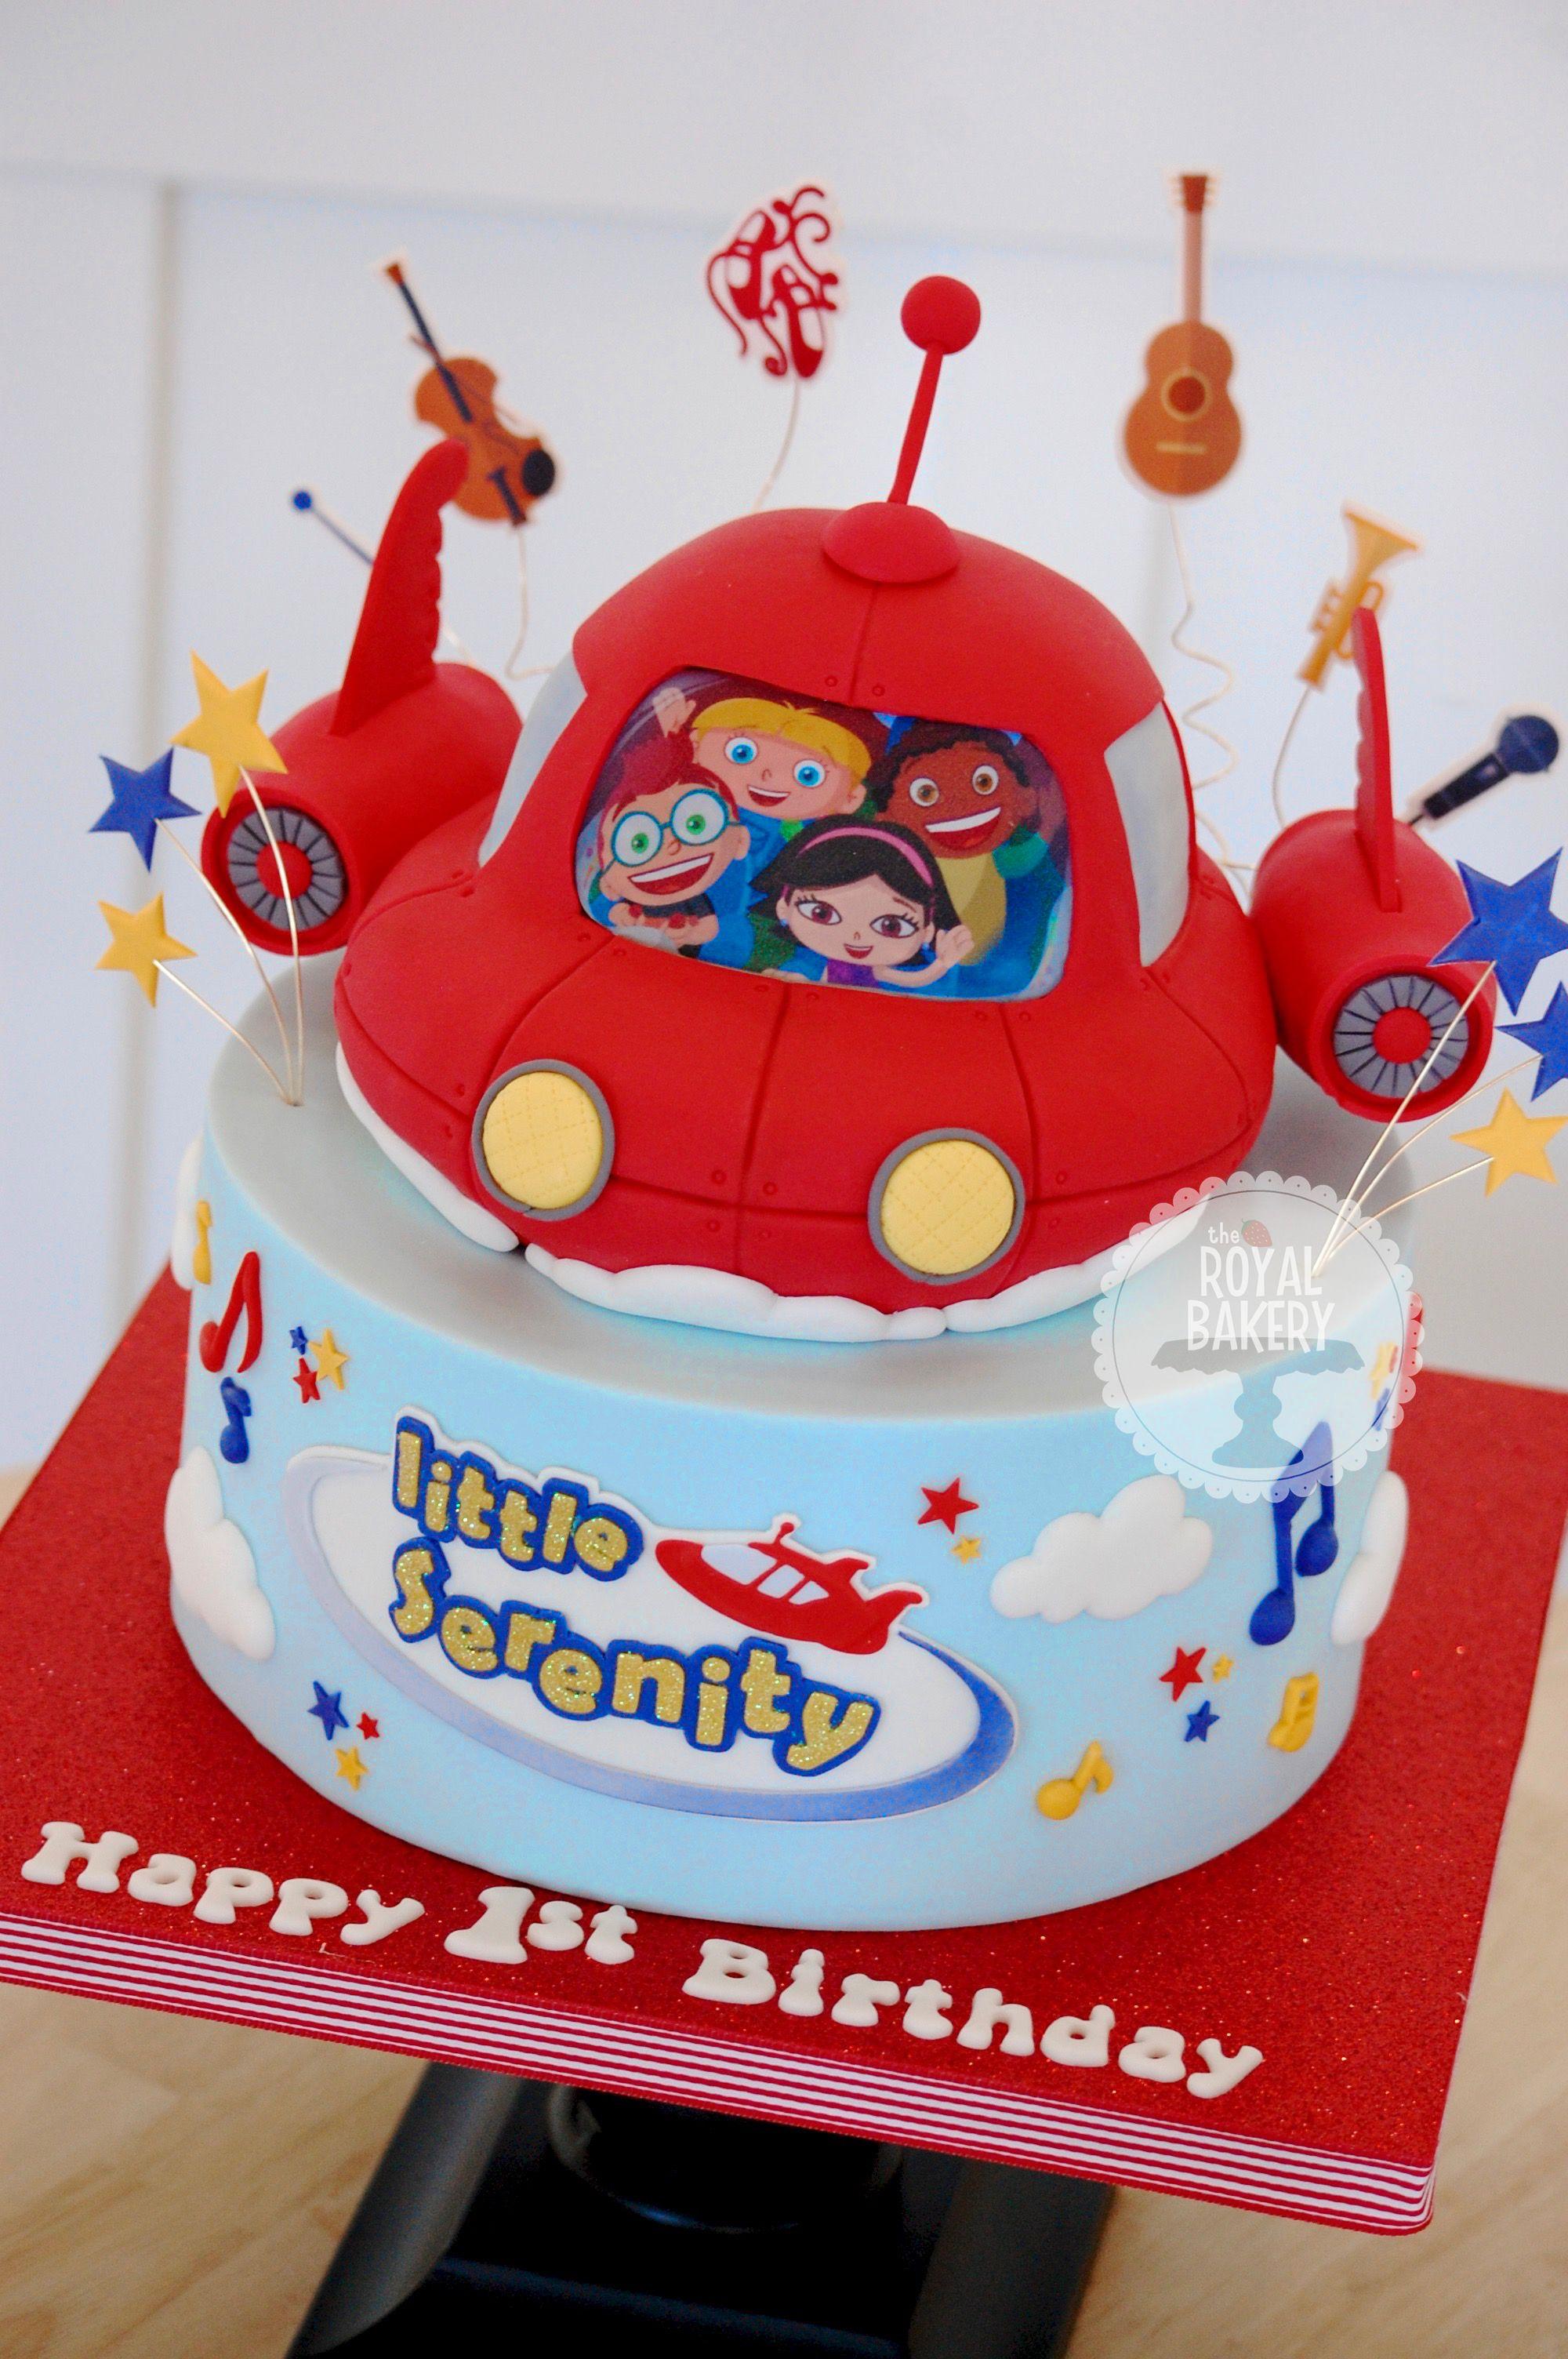 Little Einsteins Rocket Cake The Royal Bakery Pinterest Cake